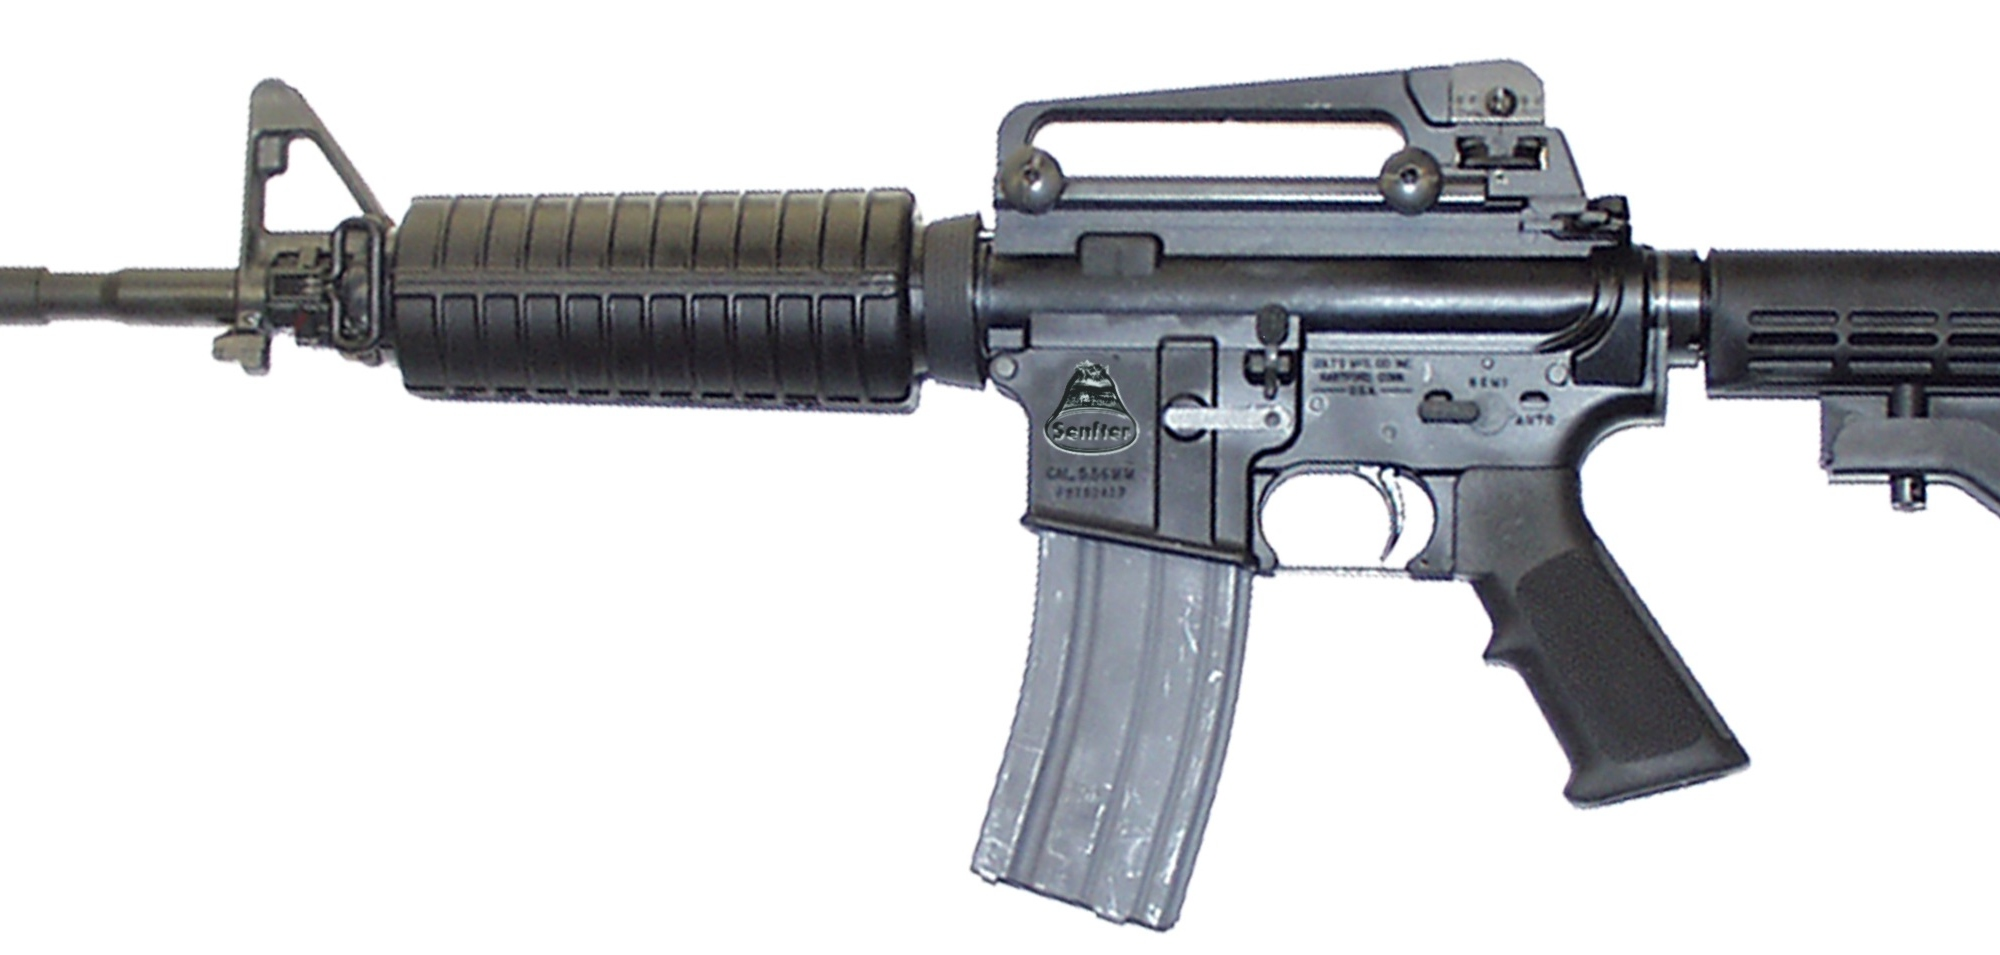 AR-15 Mil-Spec (Mil Speck)